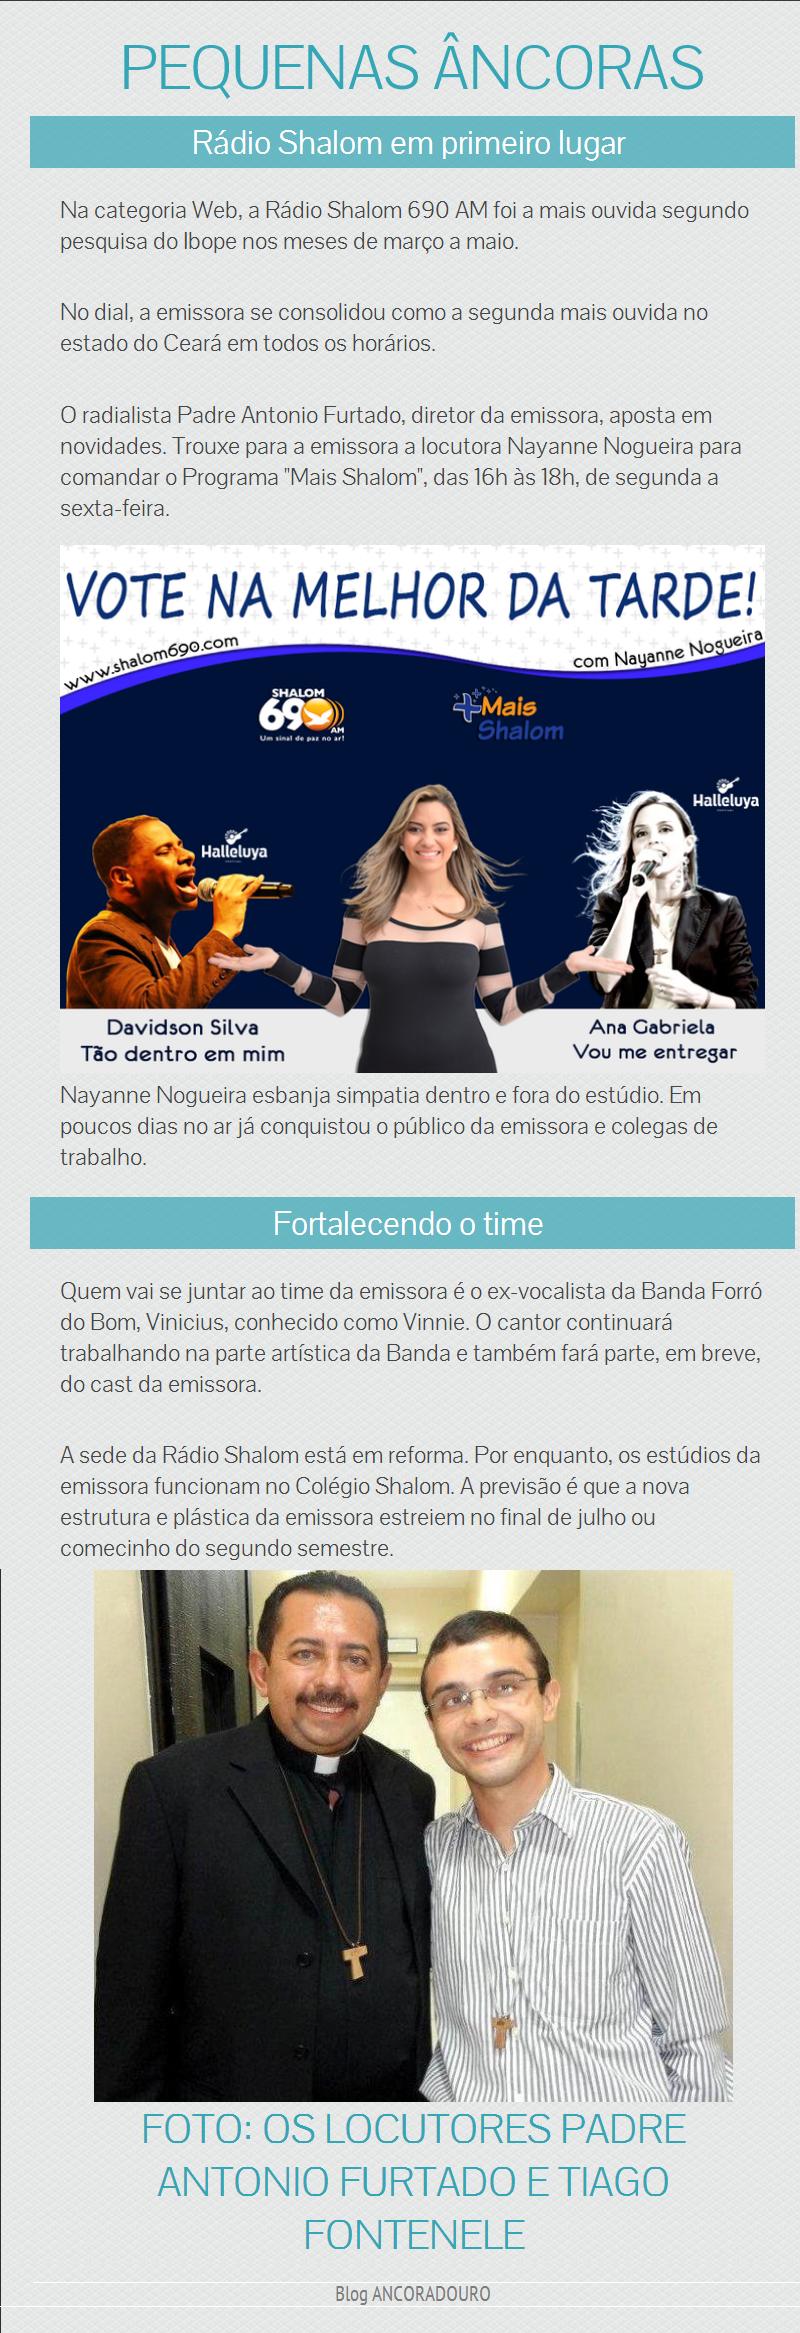 Ancoradouro_infografico_01